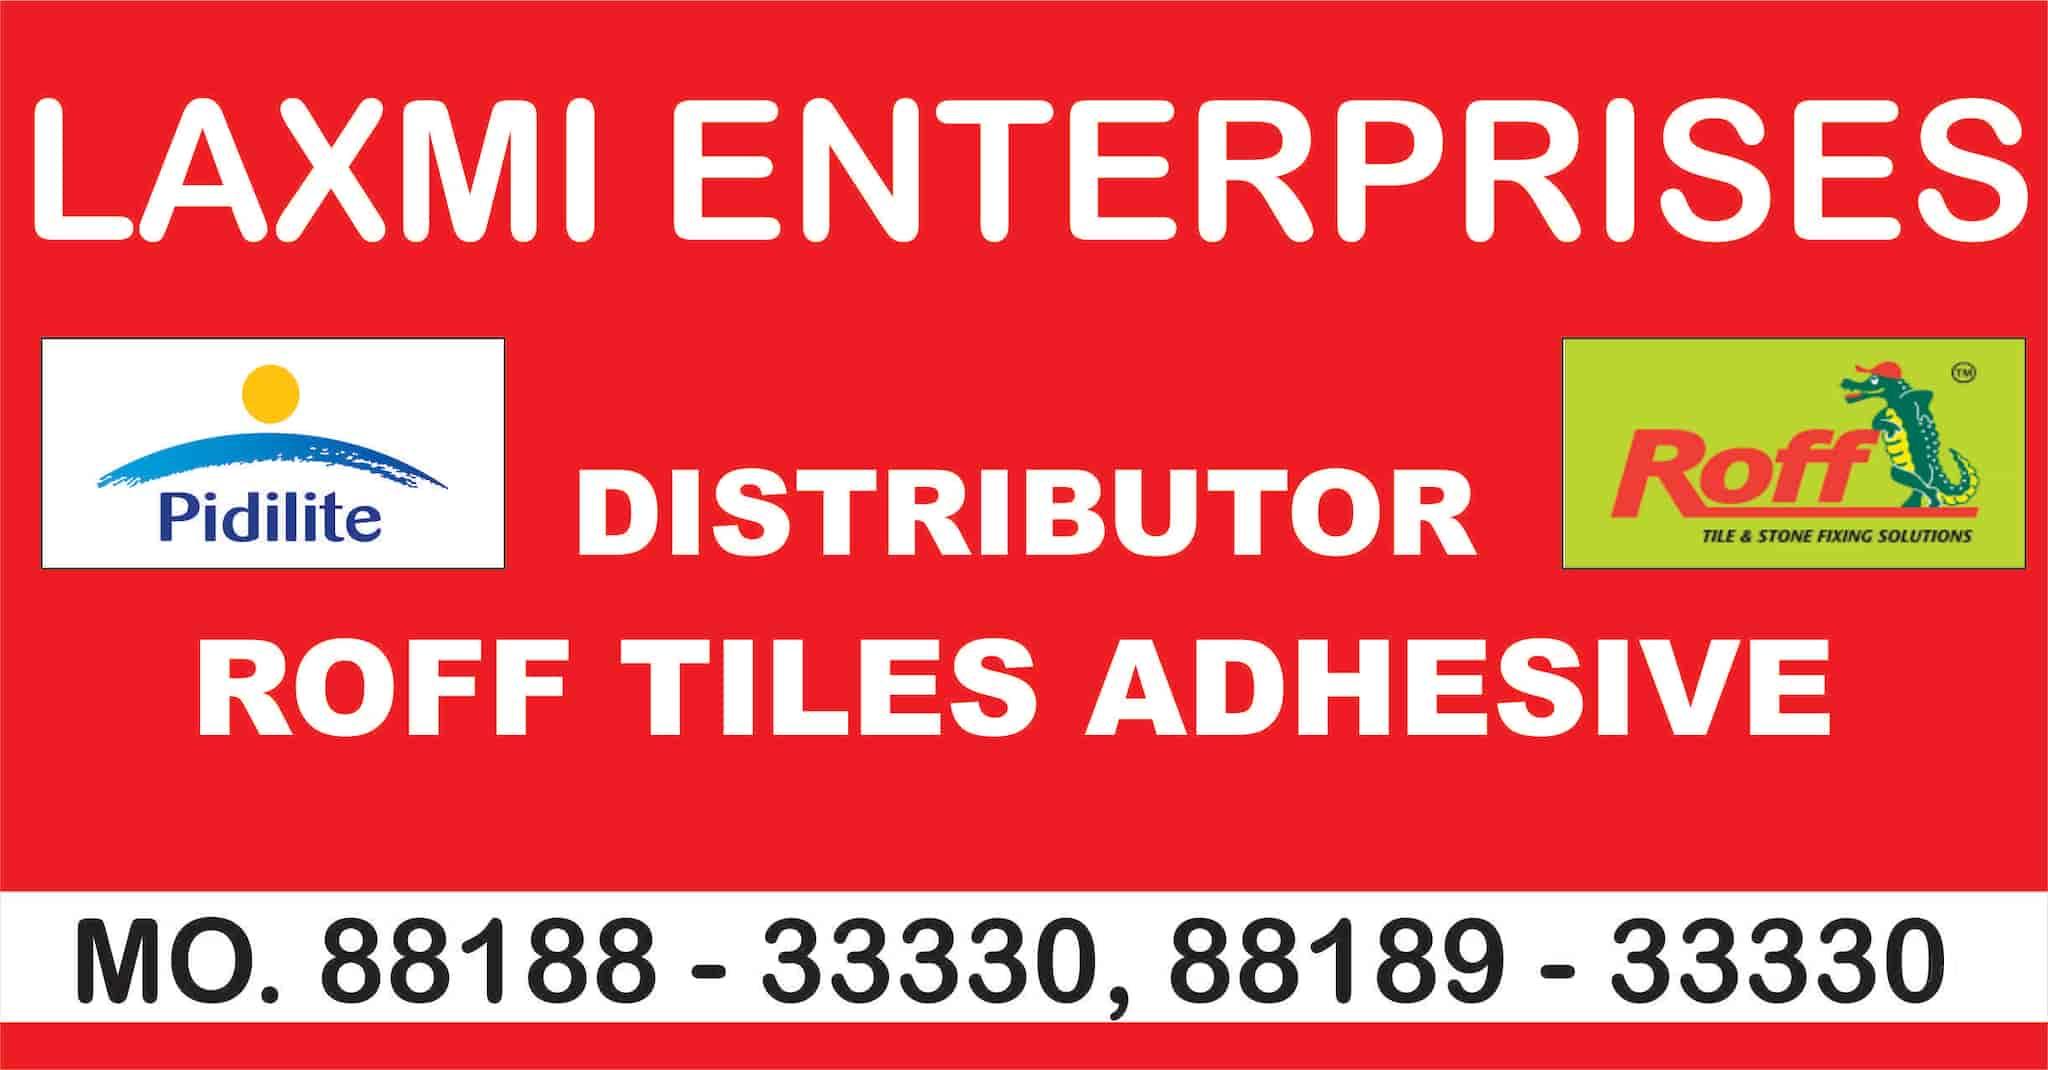 Top 30 Pidilite Adhesive Distributors In Delhi एडह स व ड स ट र ब य टर स प ड ल ट द ल ल Best Pidilite Adhesive Distributors Justdial